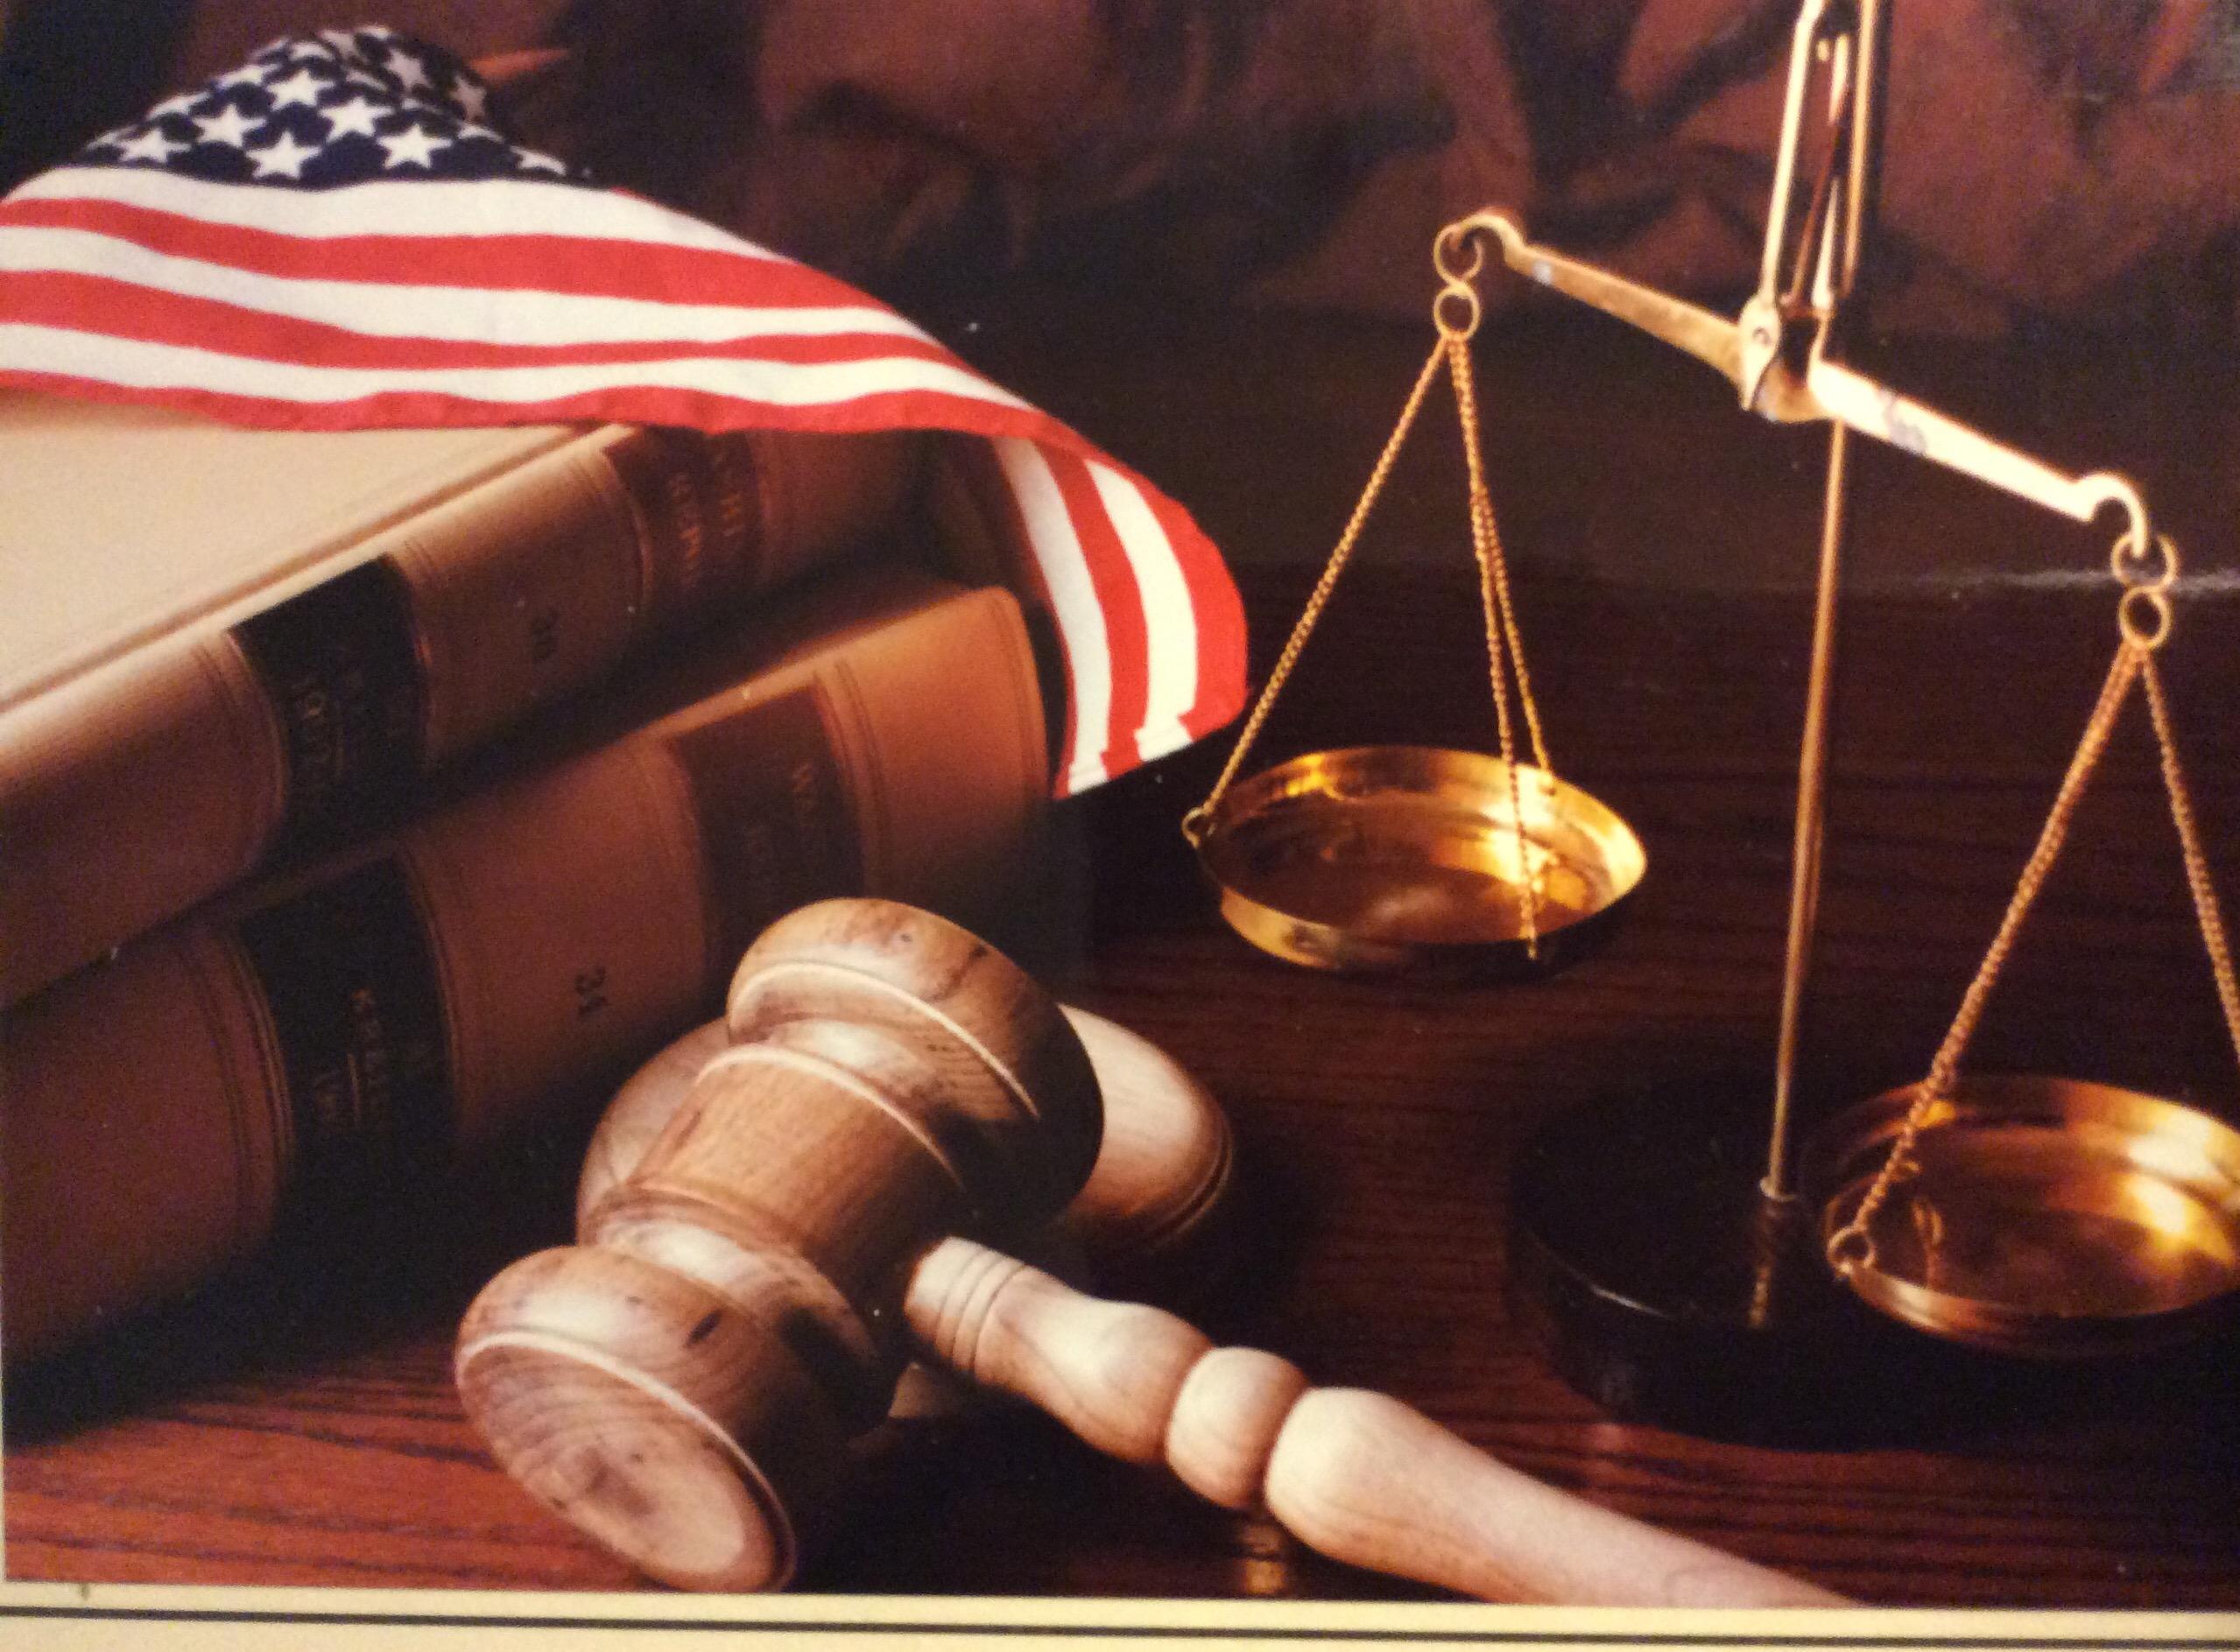 Lawman Investigations LLC image 1